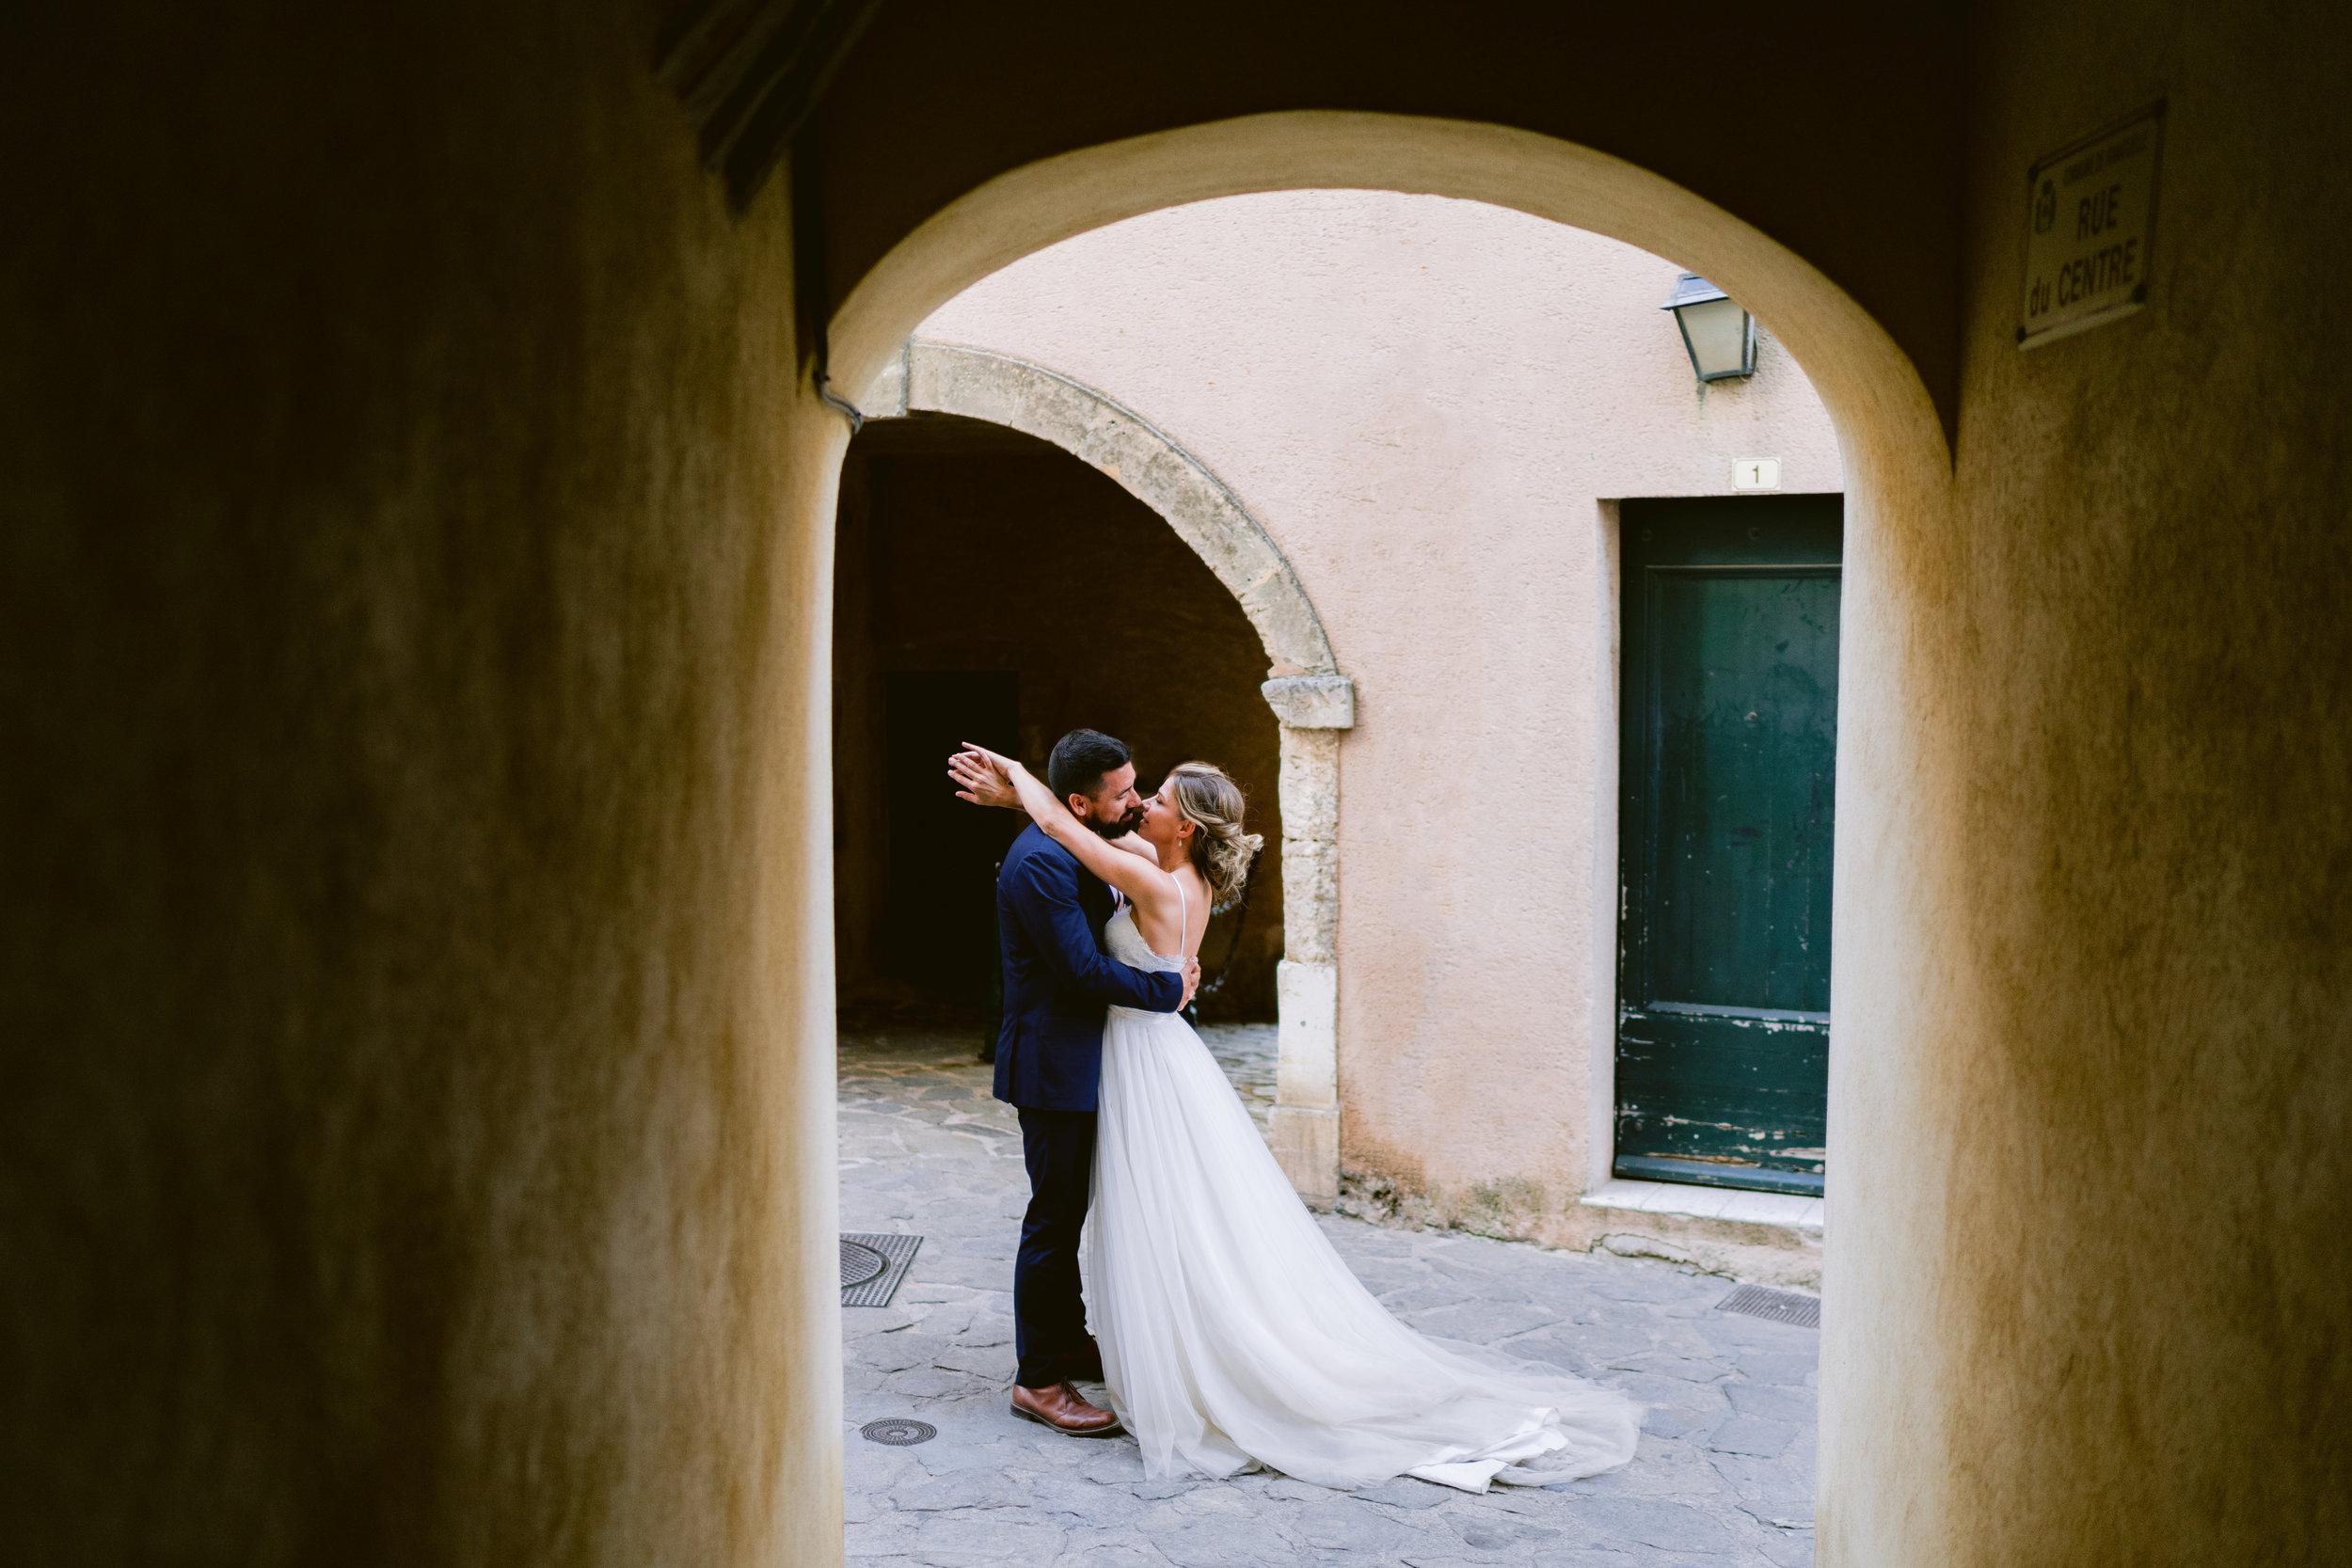 english photographer in france, wedding photographer saint tropez, romantic wedding photography france, chateau wedding france, cote d'azur wedding photographer, ramatuelle wedding (23).jpg